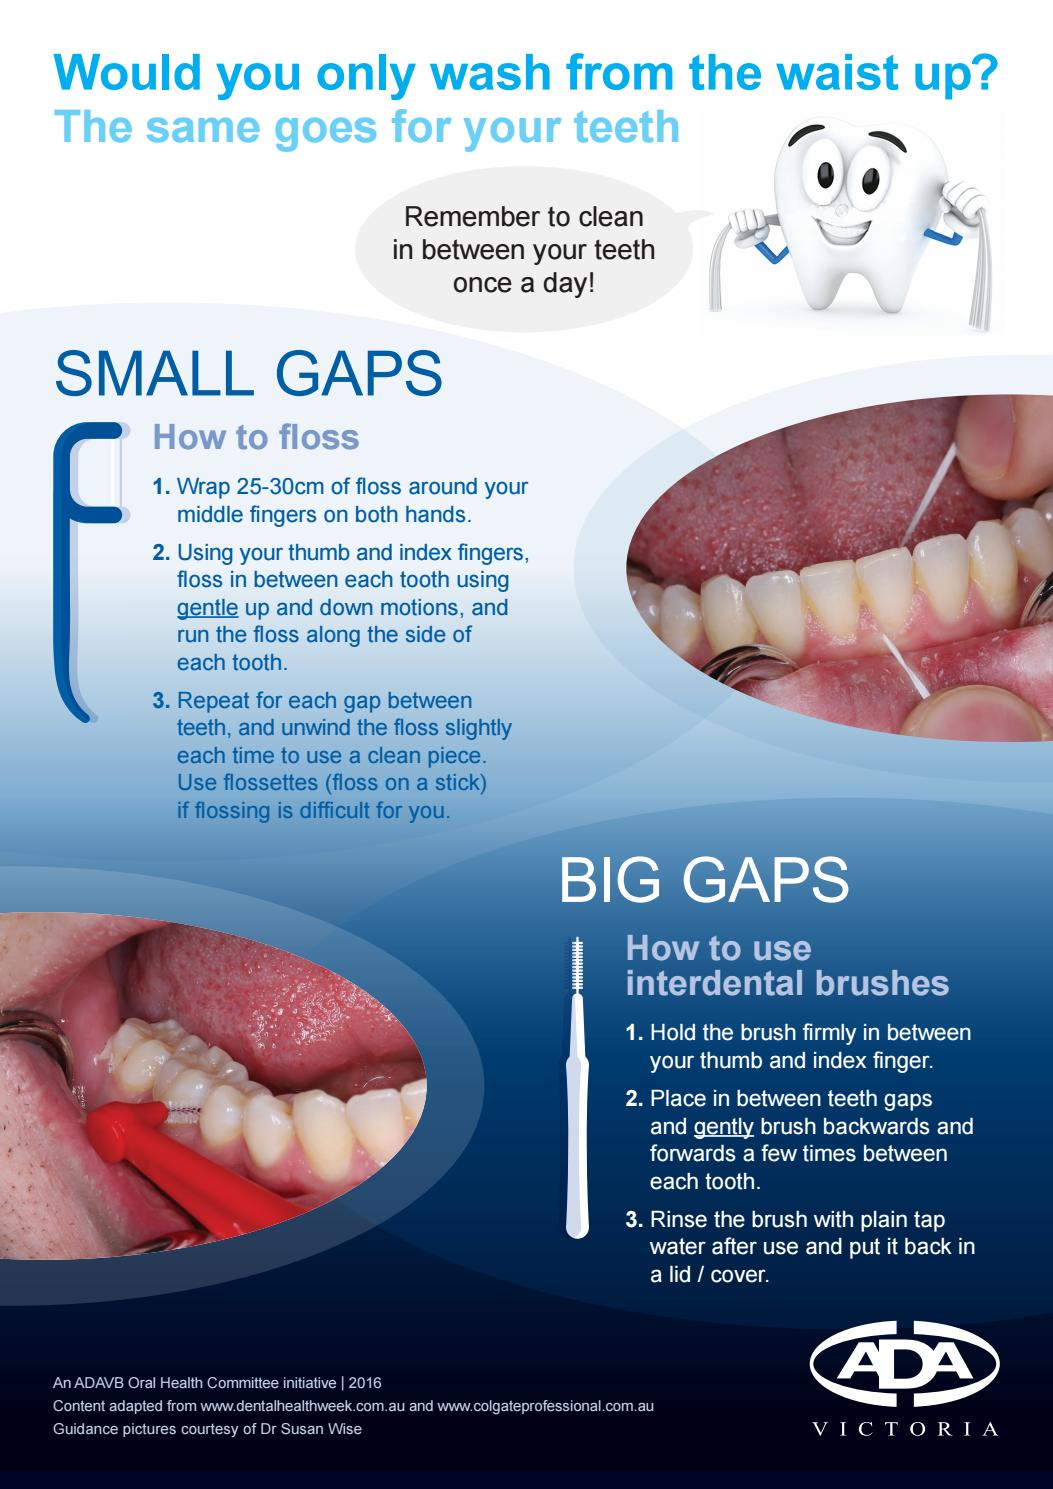 Oral through the small gap